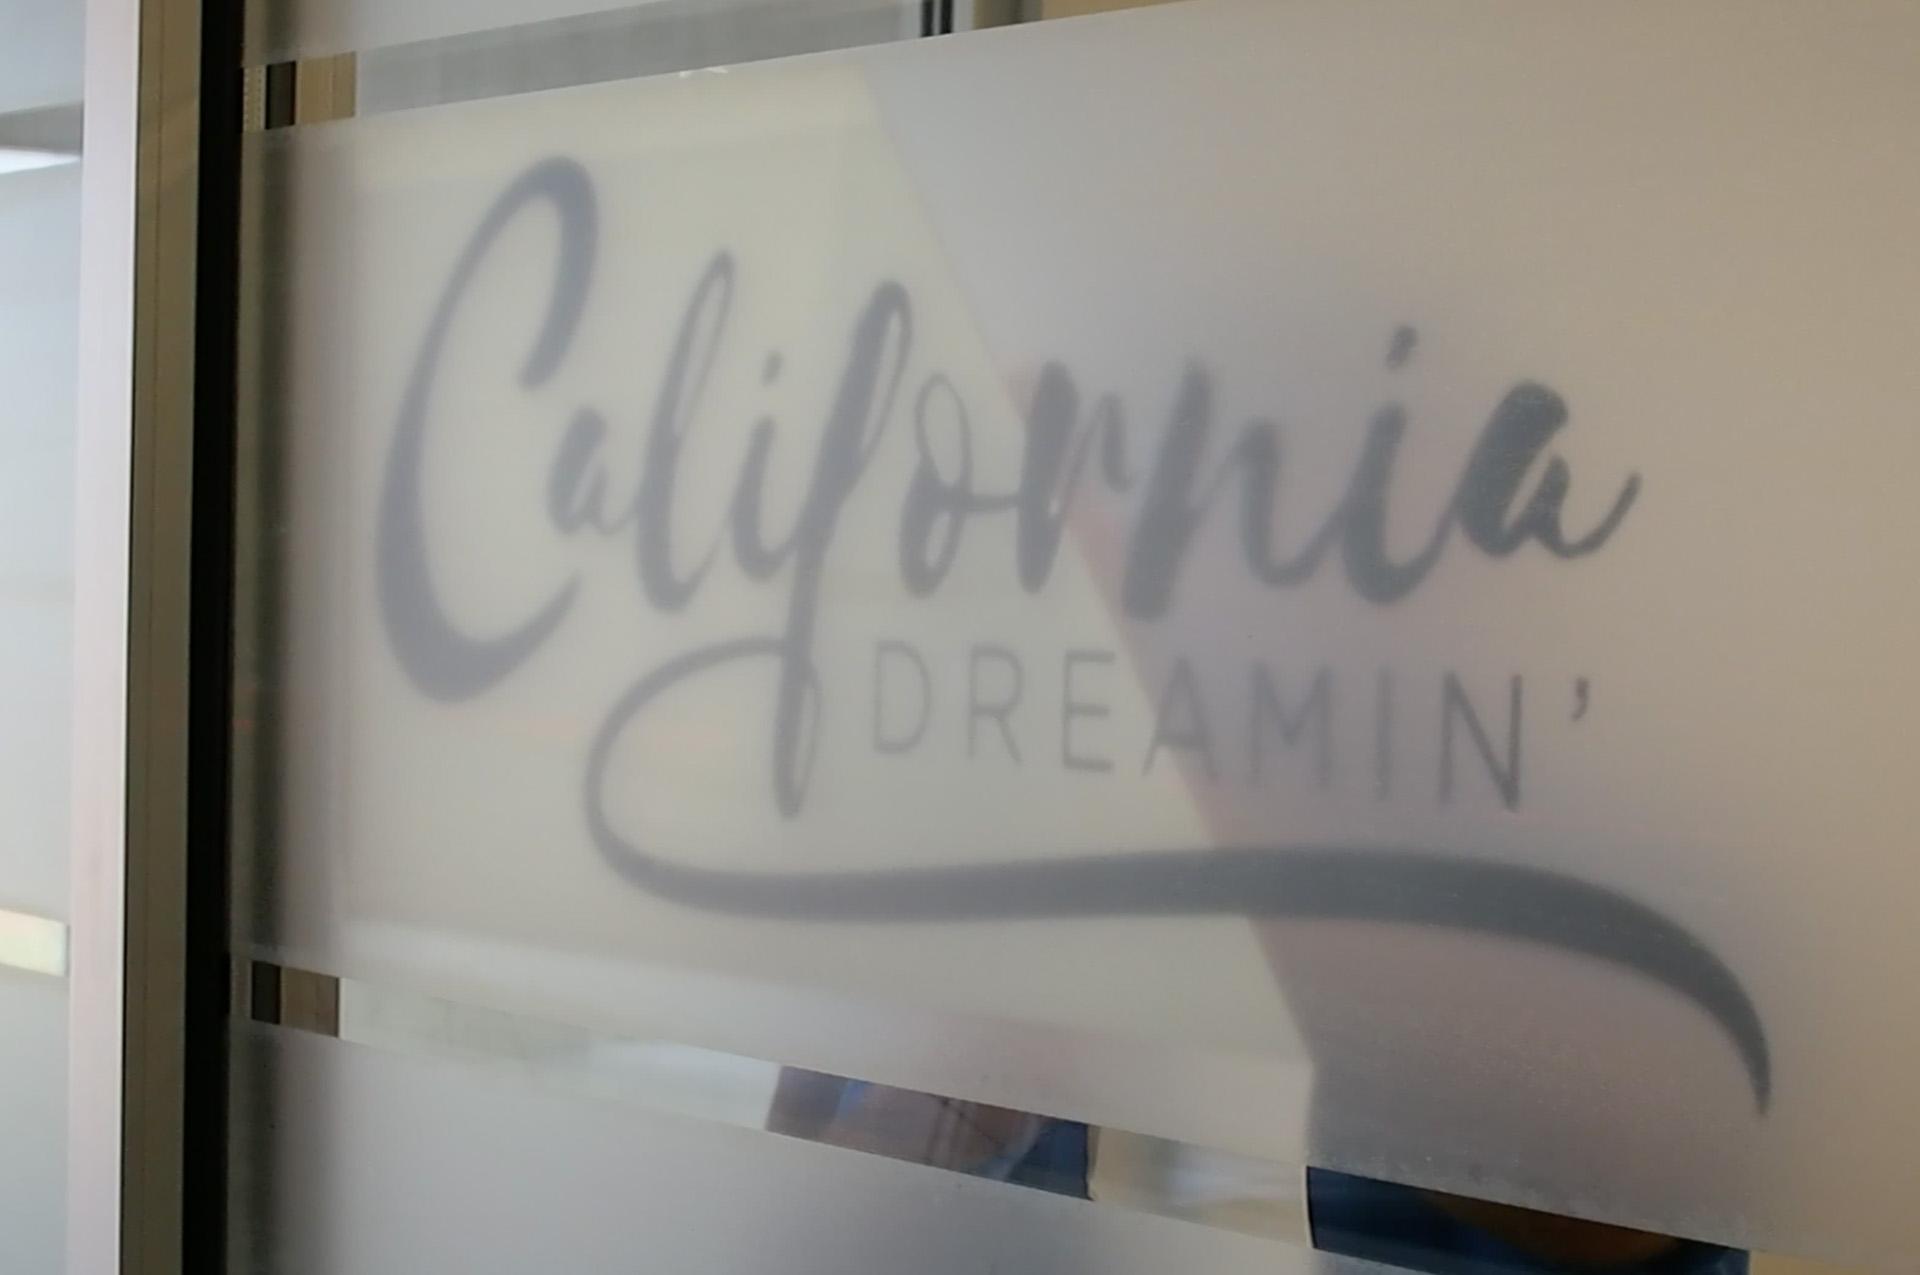 Cali Conference Room.jpg